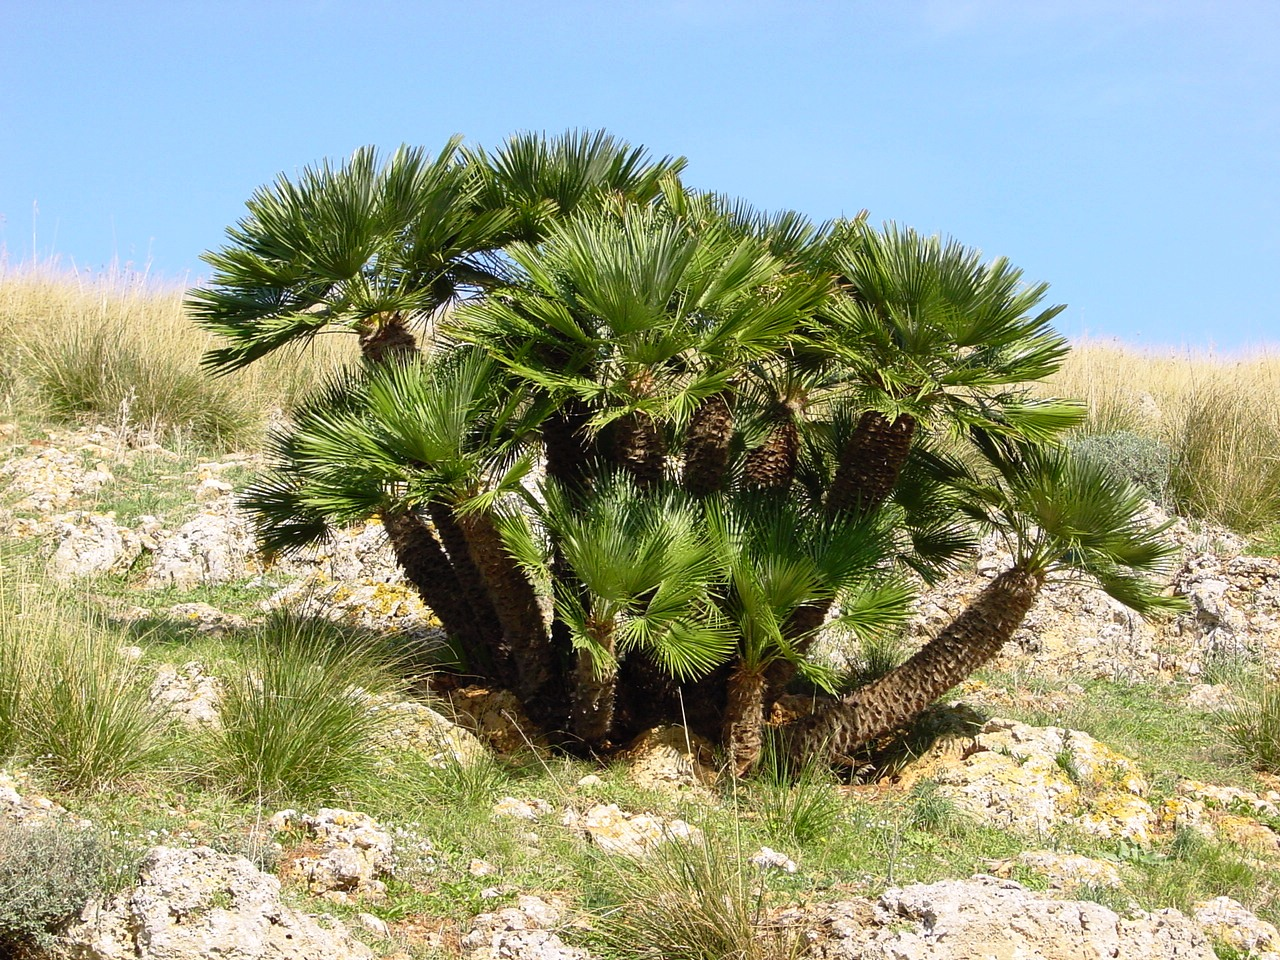 2. Palmito o Chamaerops humilis. Autor, Zingaro